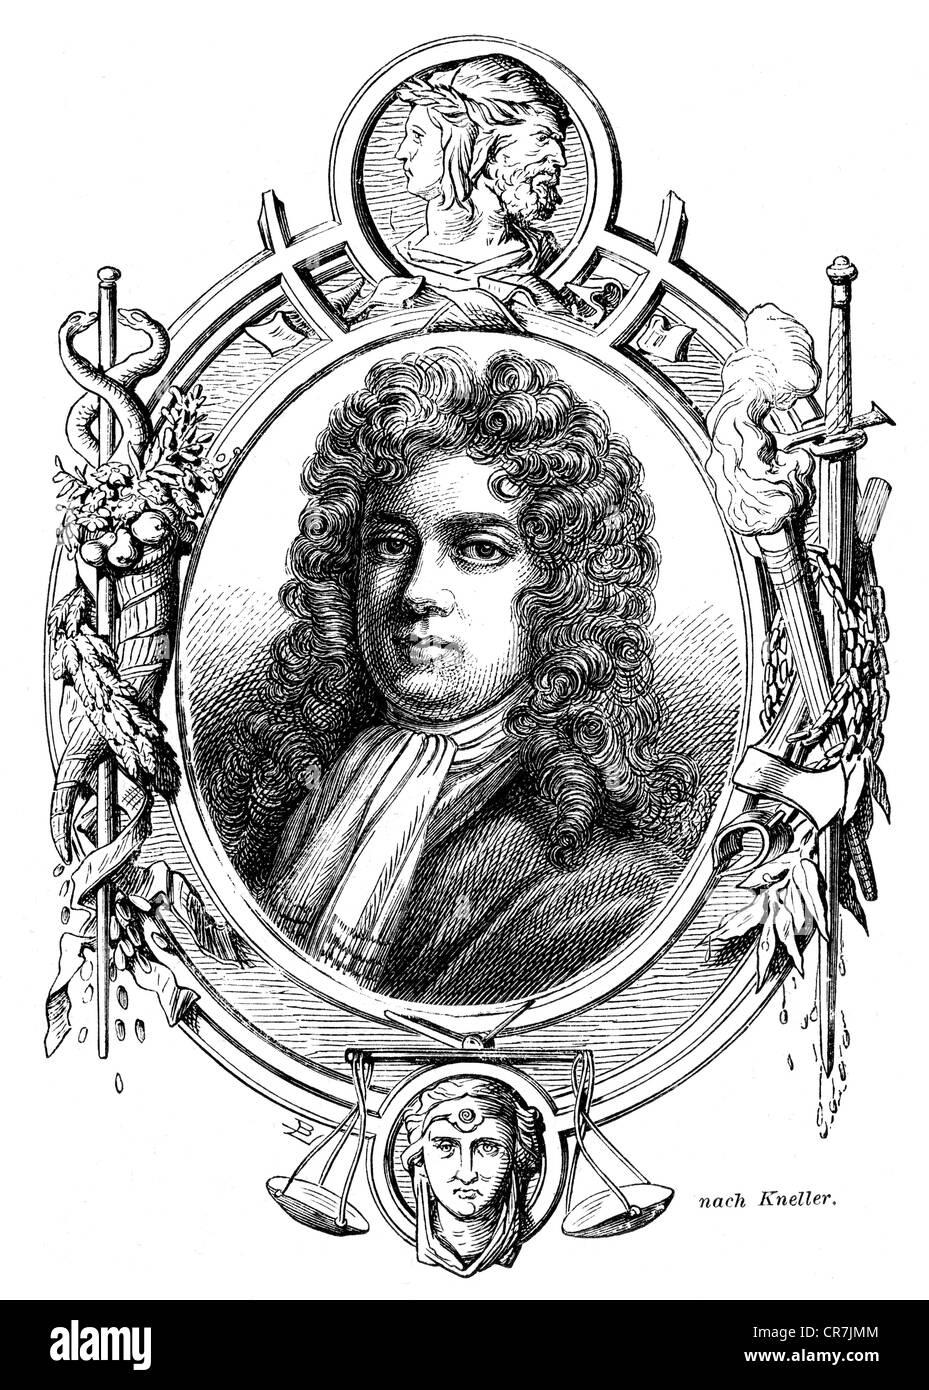 Montagu, Charles, 1st Duke of Manchester, 1656 - 20.1.1722, English politician, portrait, wood engraving, 19th century, - Stock Image